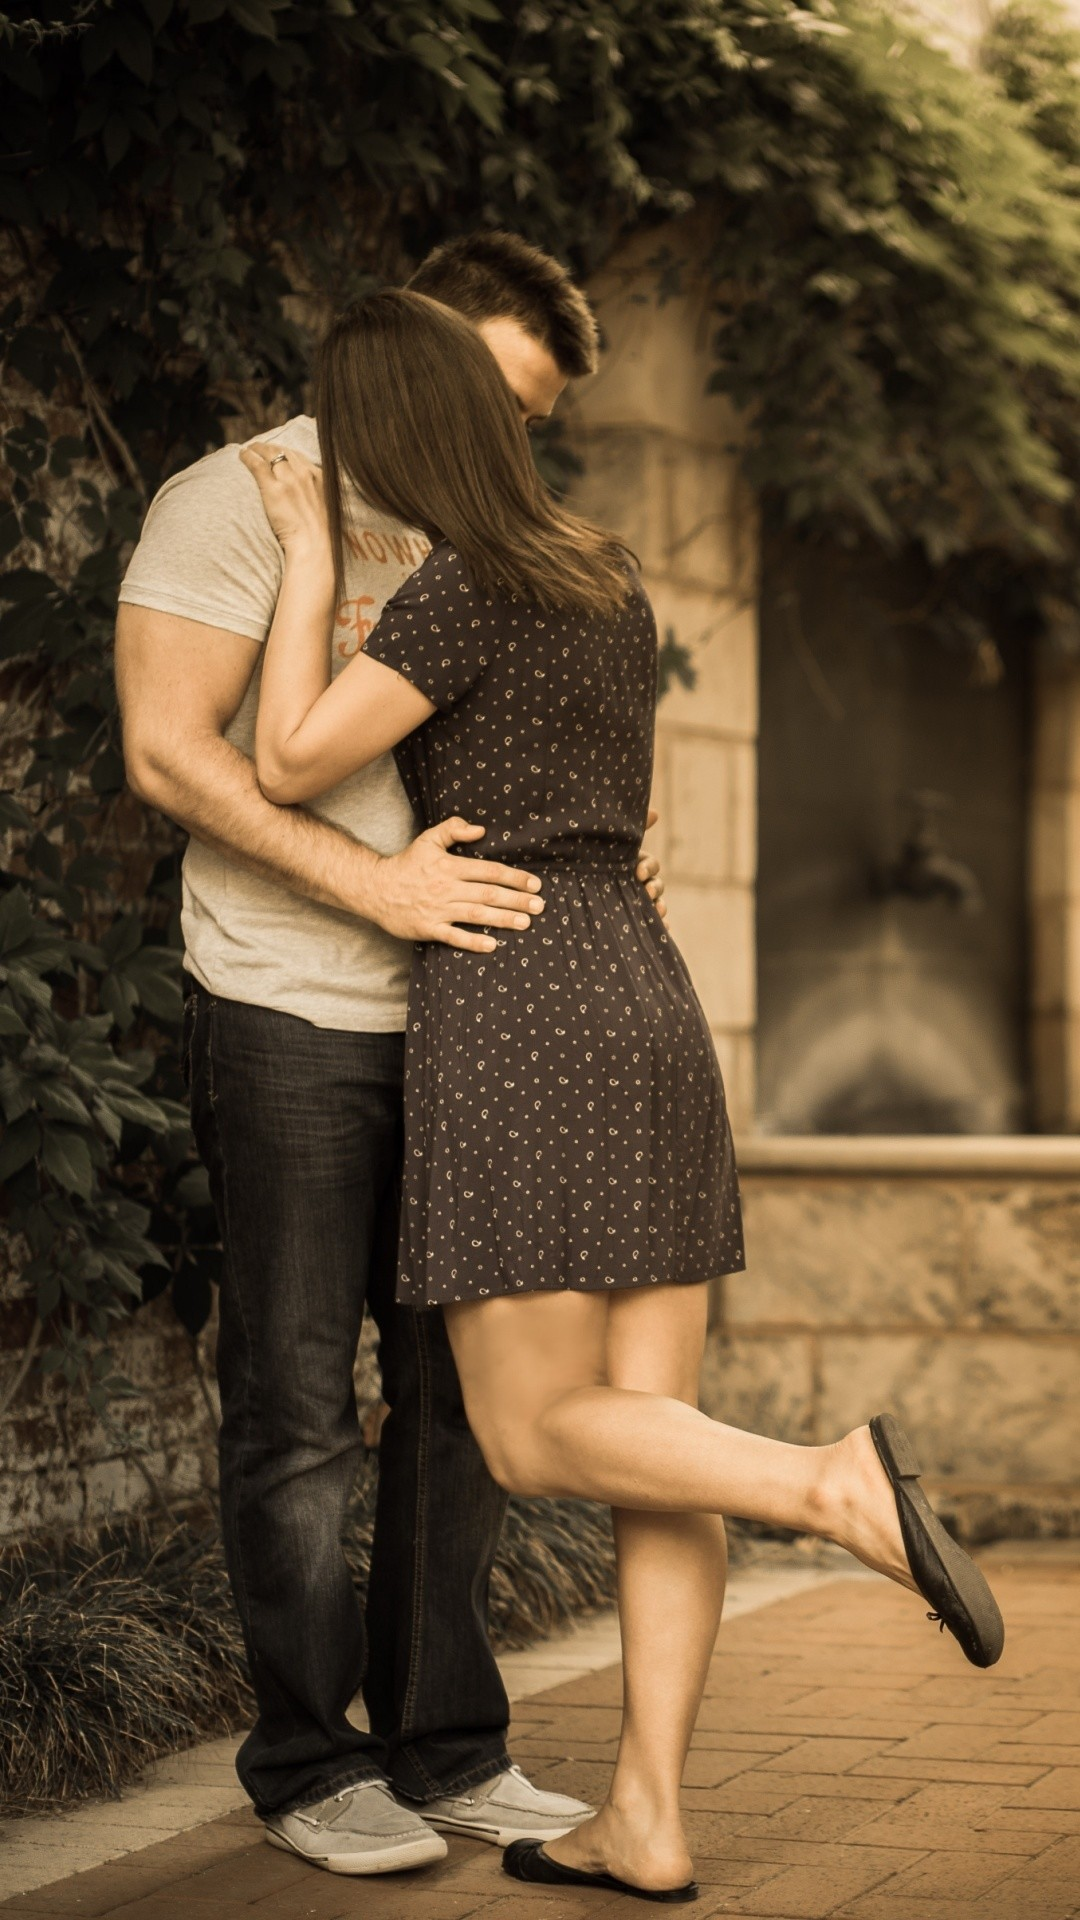 Love couple kisses wallpapers wallpapertag - 4k kiss wallpaper ...